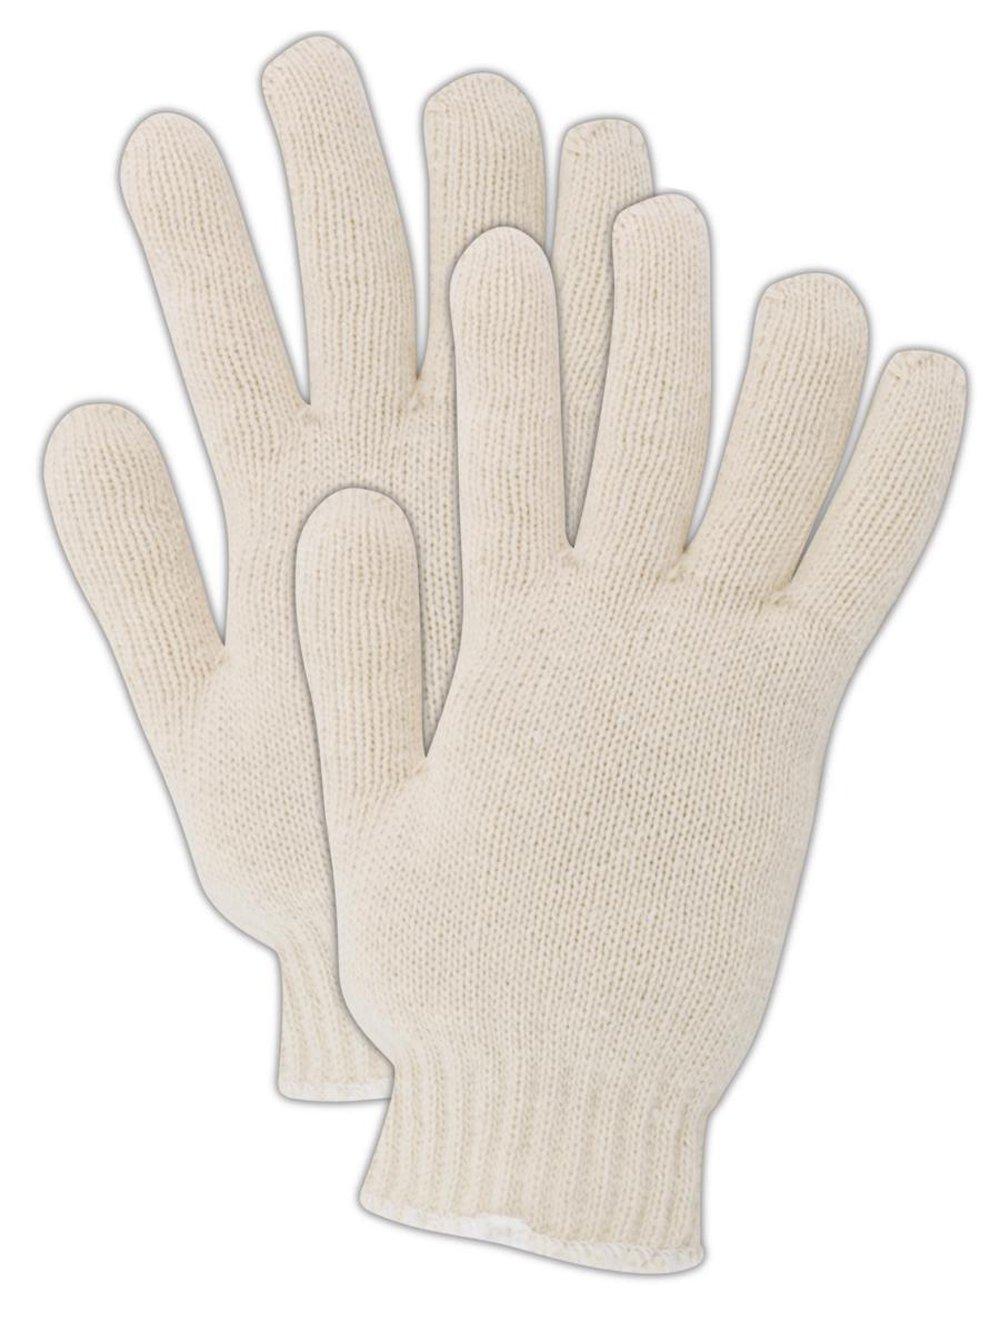 Magid KnitMaster T143 Cotton/Polyester Glove, Knit Wrist Cuff, 9.5'' Length, Men's  (One Dozen)